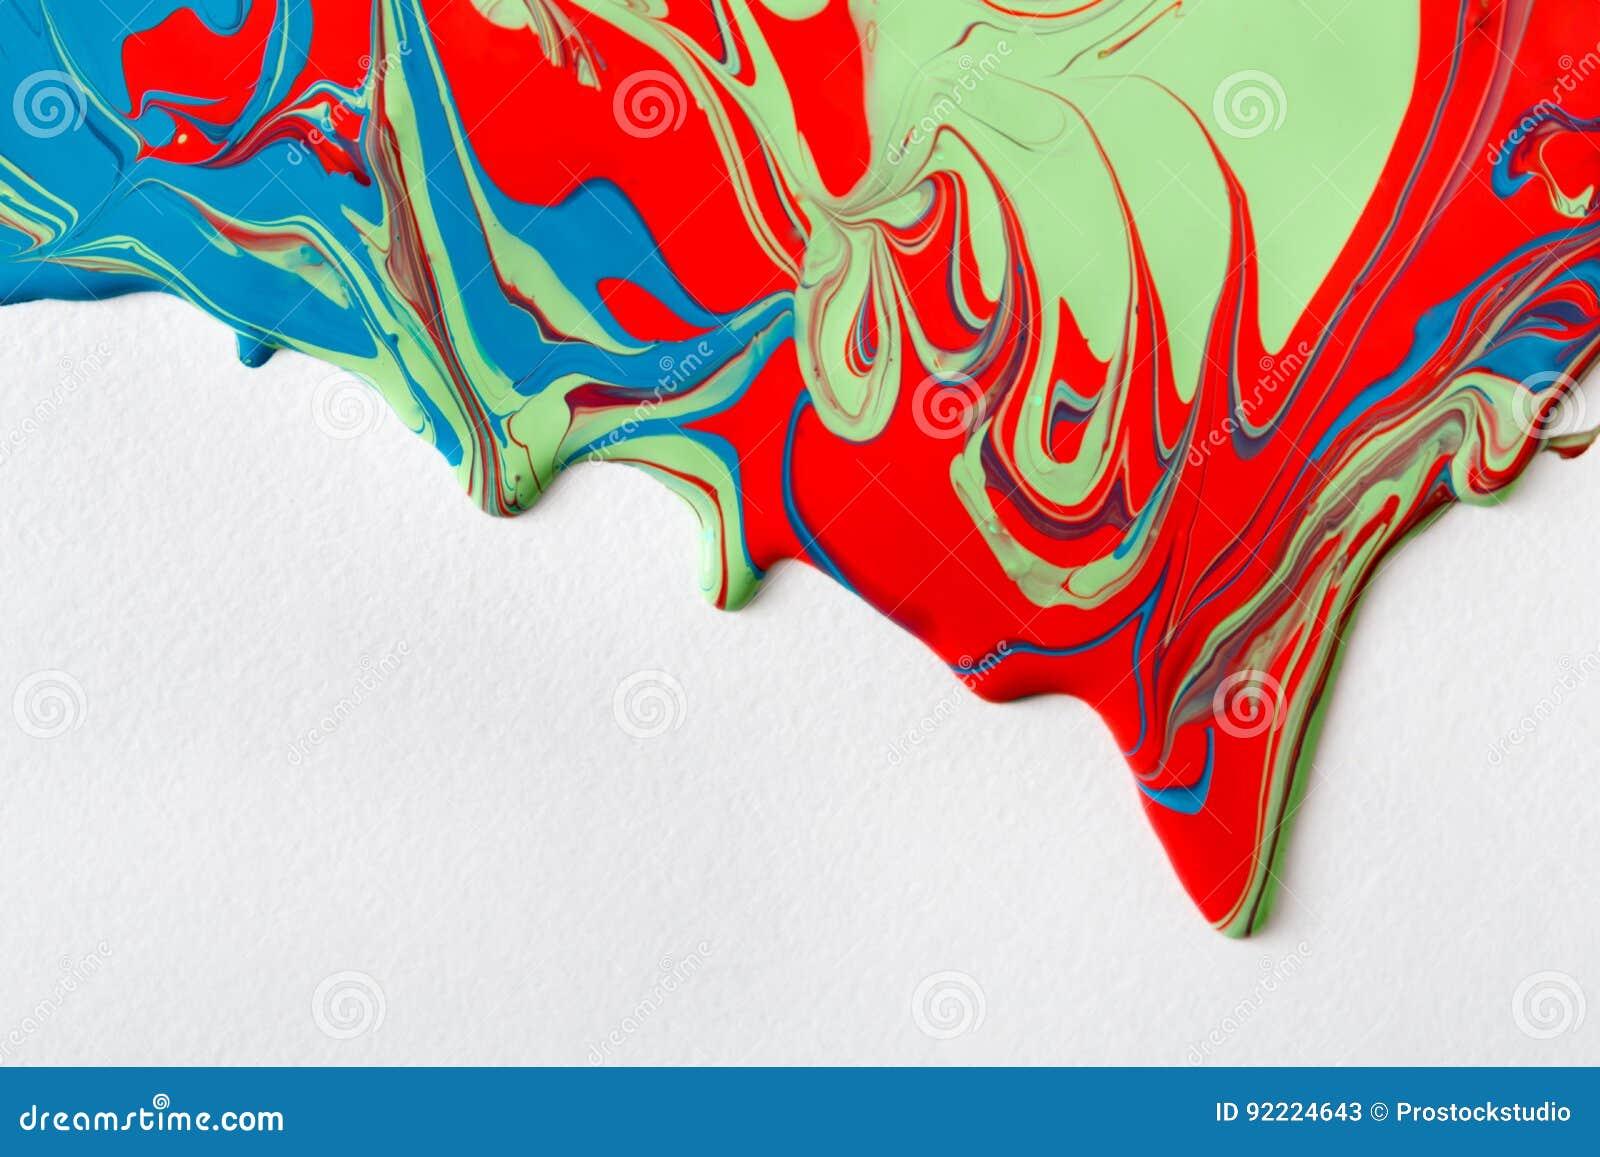 Liquid Marbling Acrylic Paint Background Fluid Painting